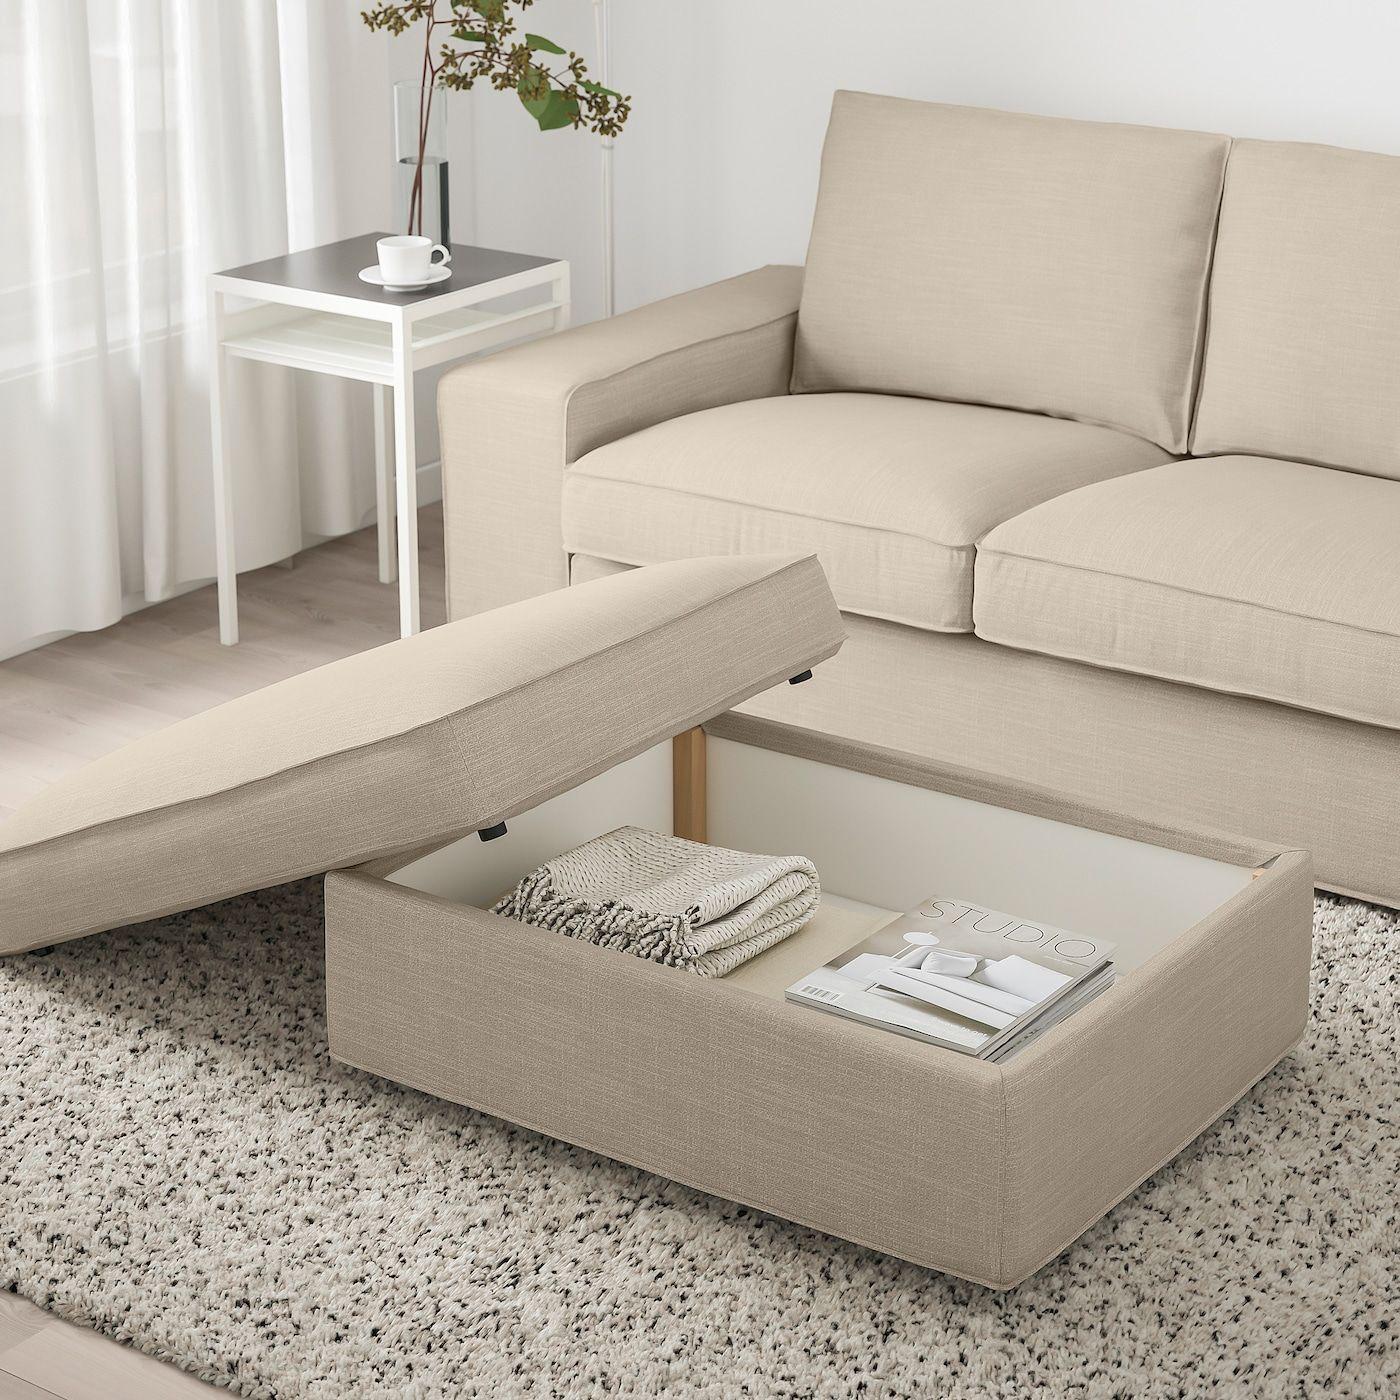 Kivik Footstool With Storage Hillared Beige Ikea In 2020 Storage Footstool Storage Ottoman Ikea Kivik